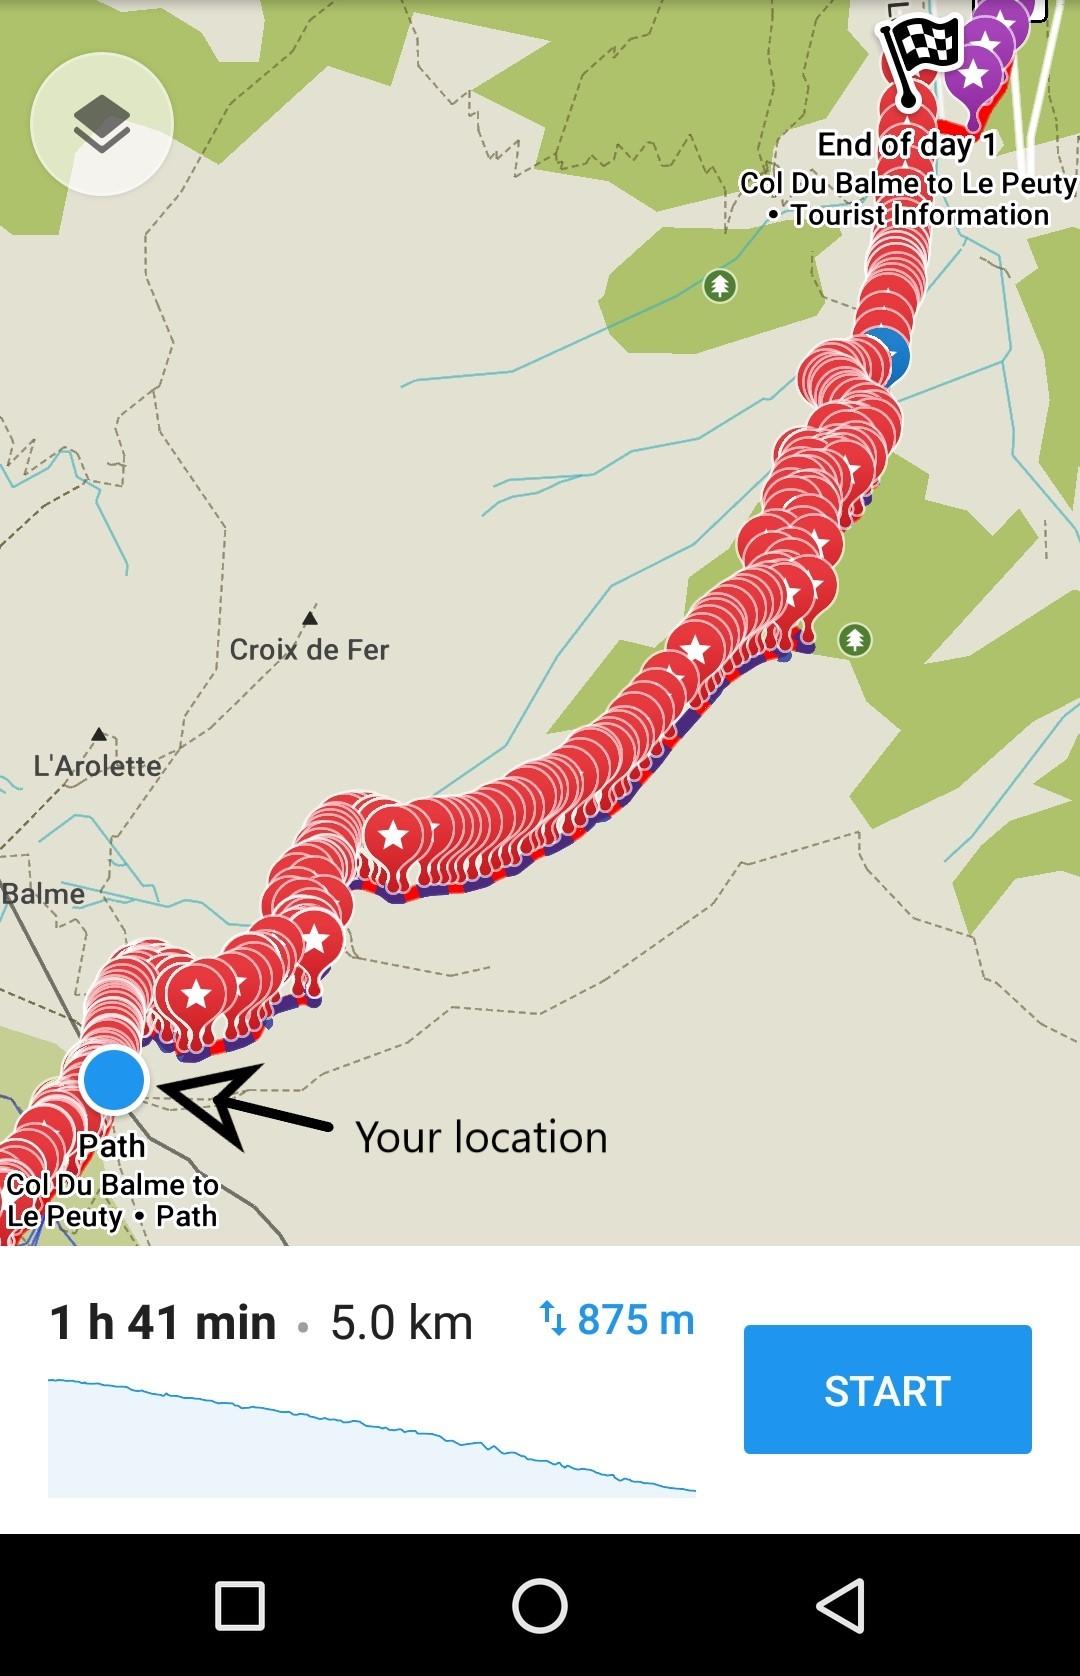 Haute Route Chamonix Zermatt maps with GPS coordinates